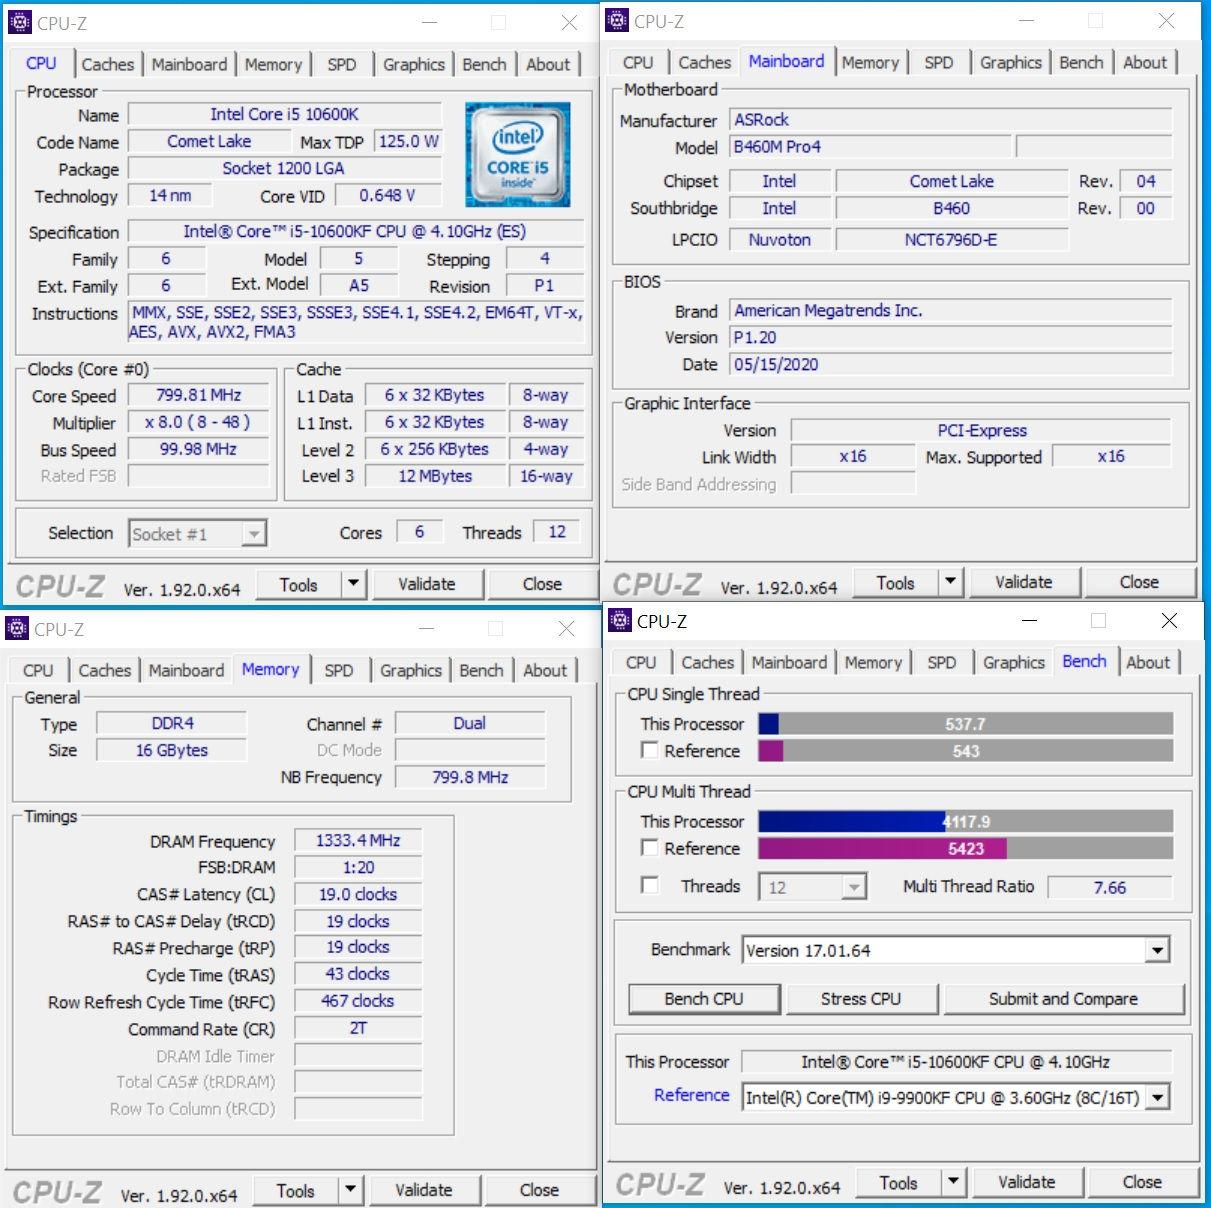 ASRock_B460M_Pro4_cpuz-benchmark